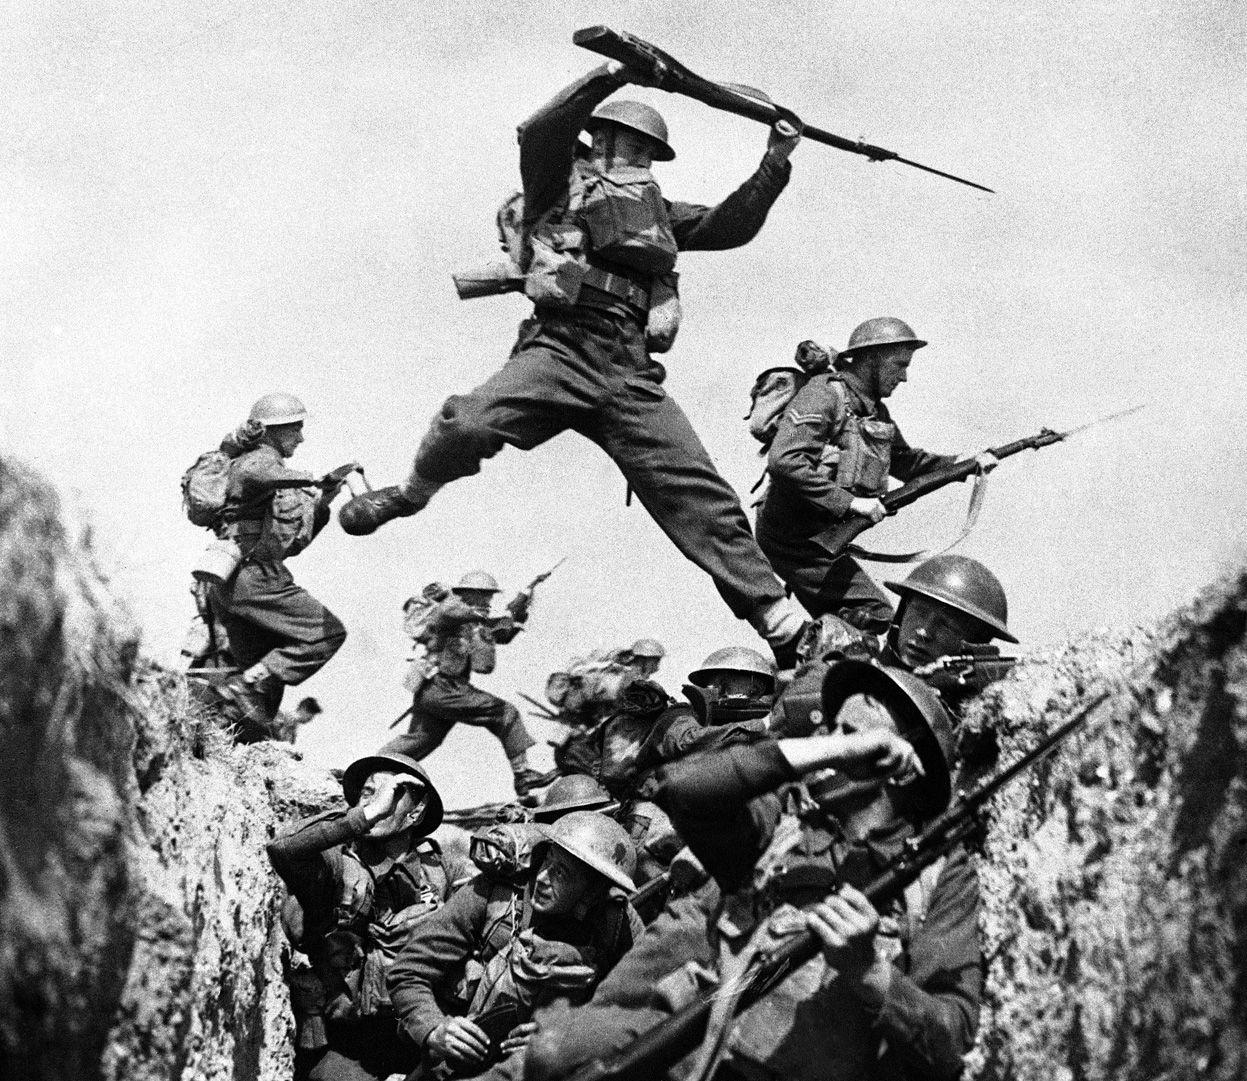 Pin by Franco Gurskis on World War 2 British | Pinterest ...